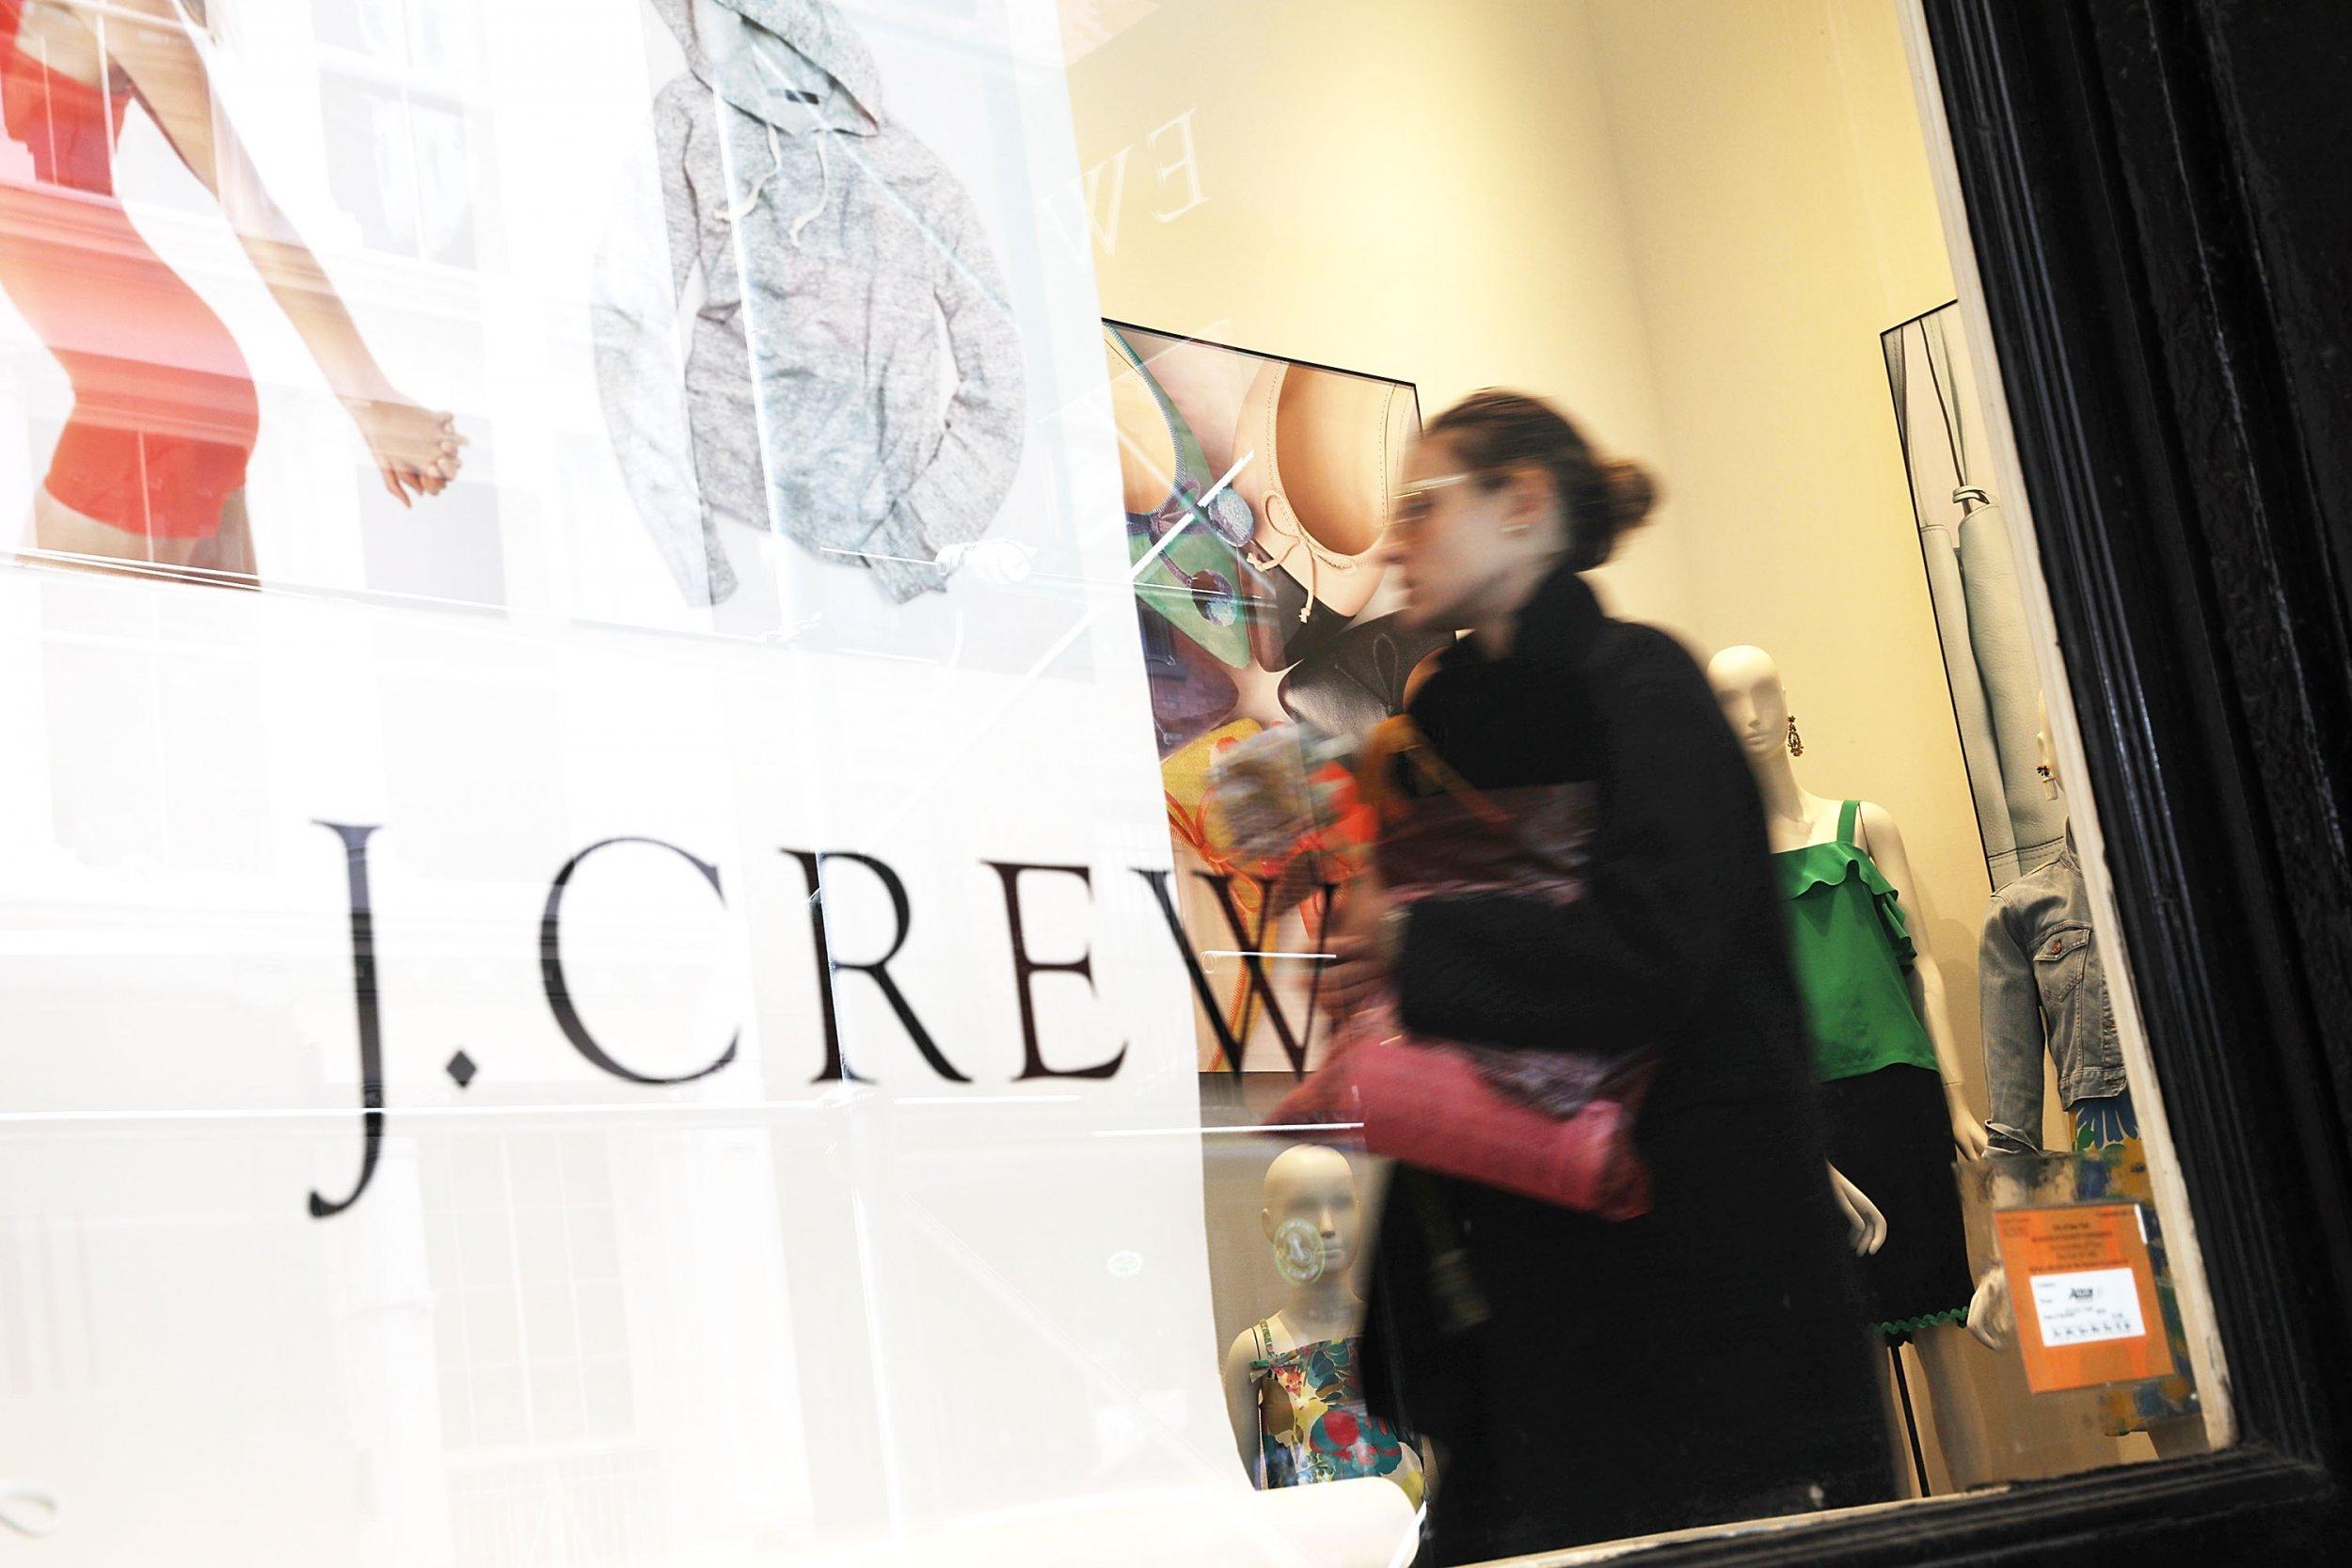 j crew store front